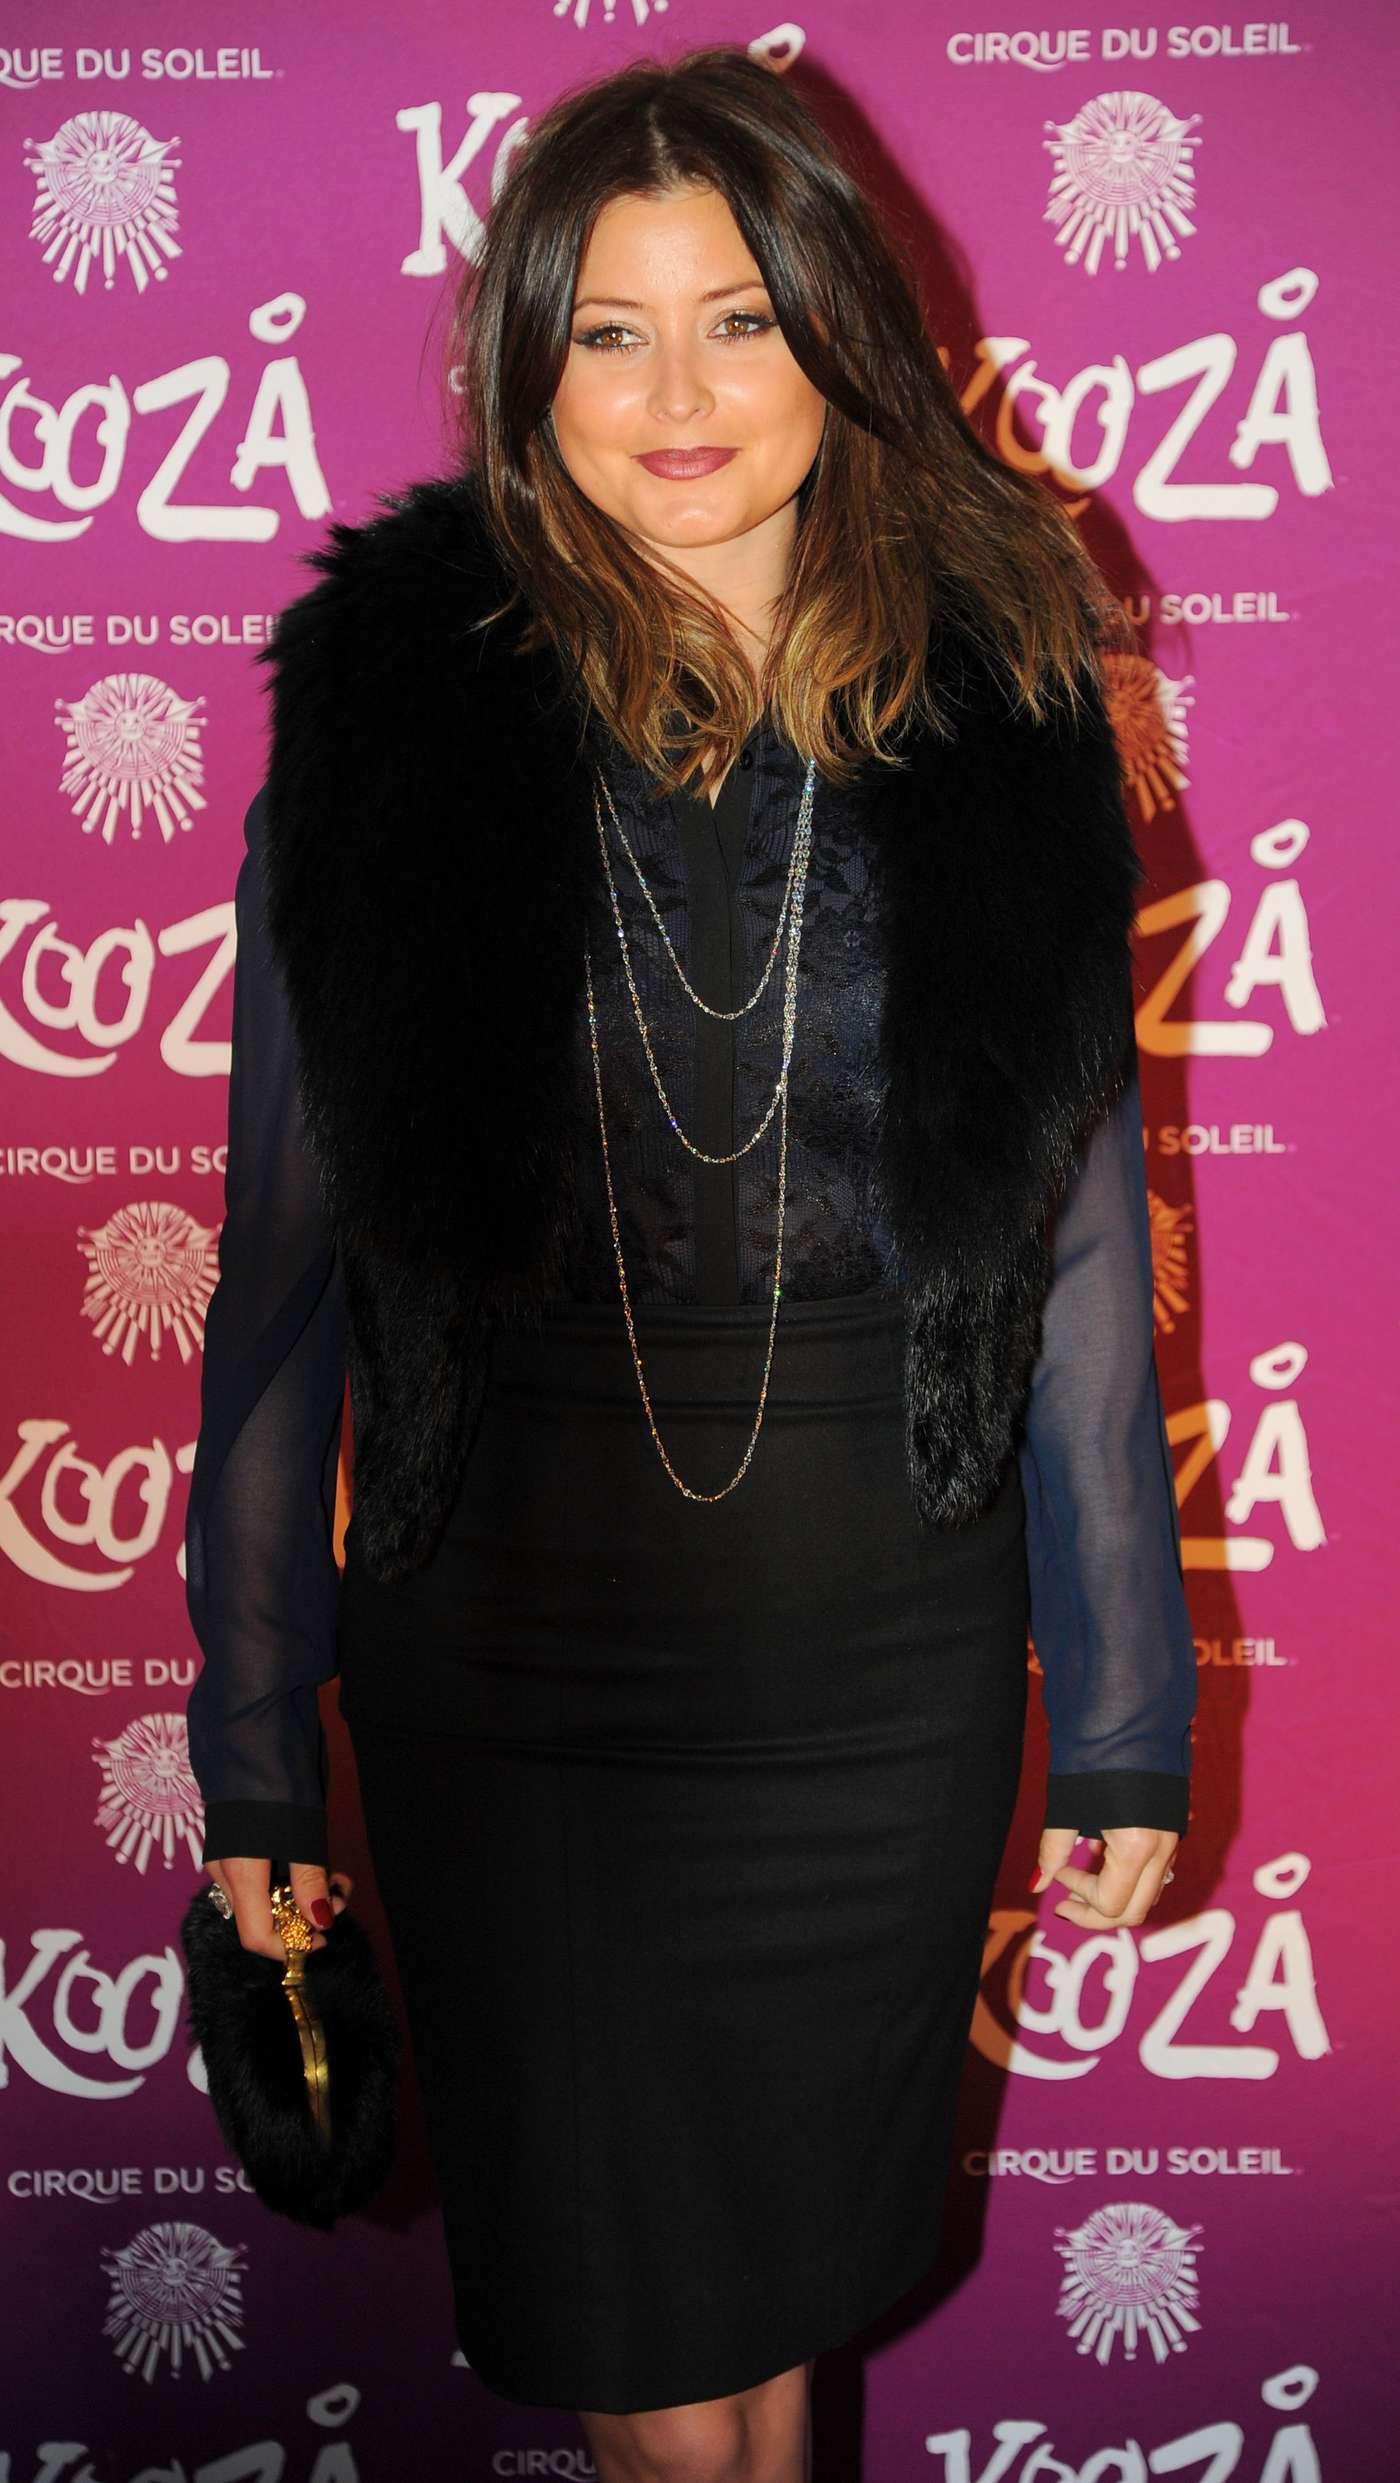 Holly Valance Du Soleils Kooza Opening night in London